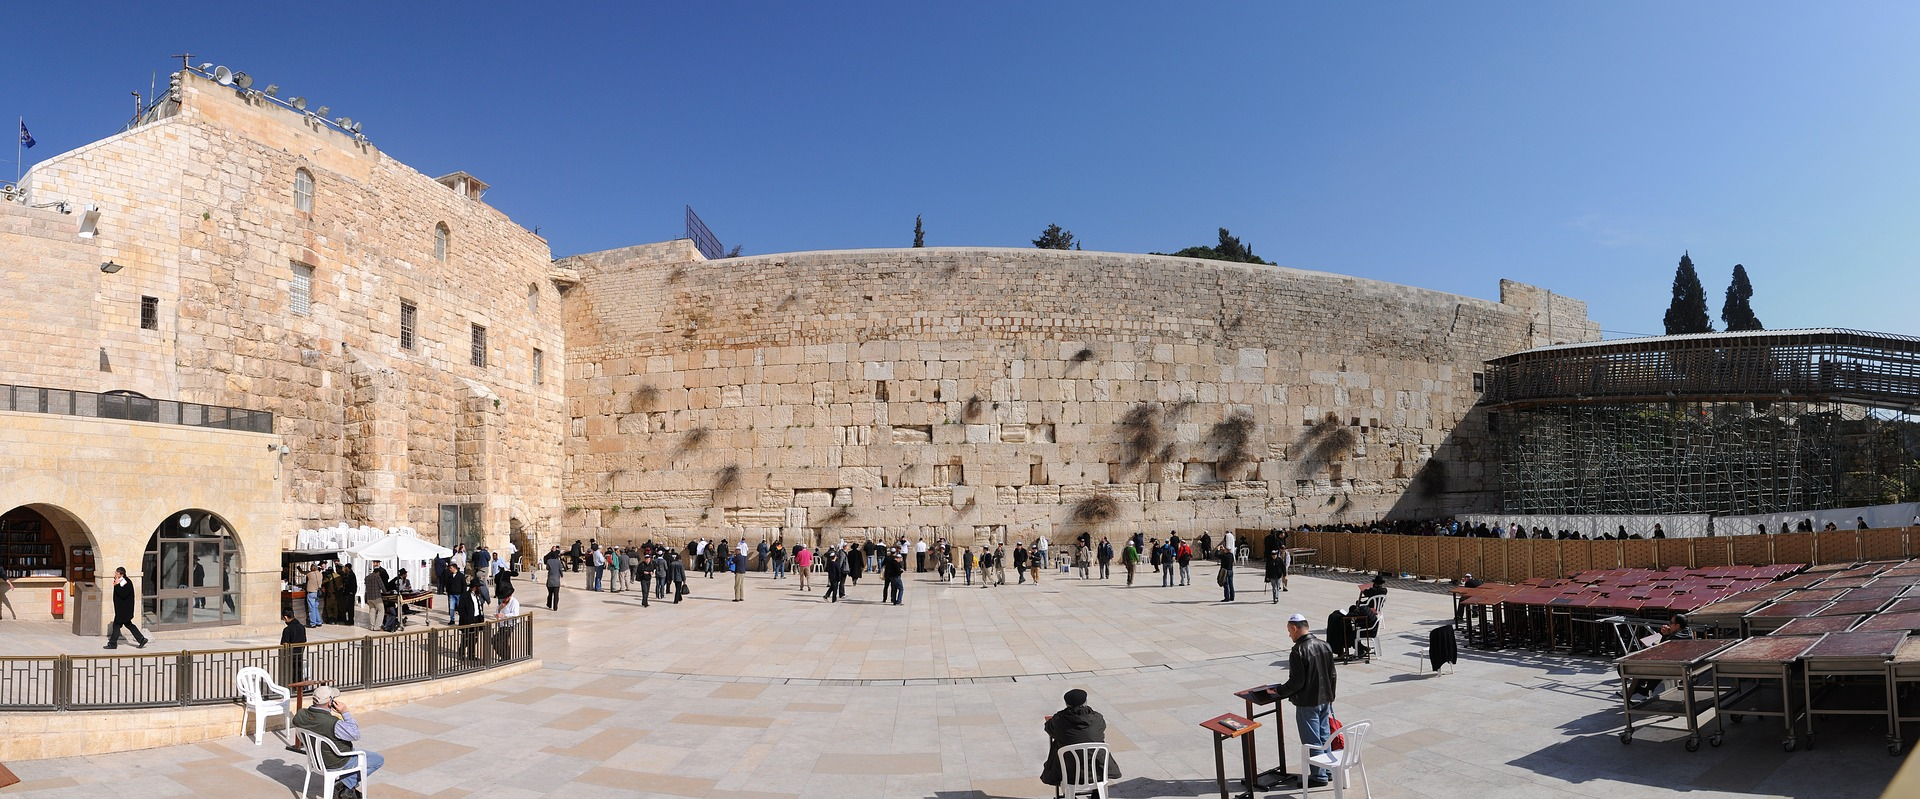 le mur des lamentations israel